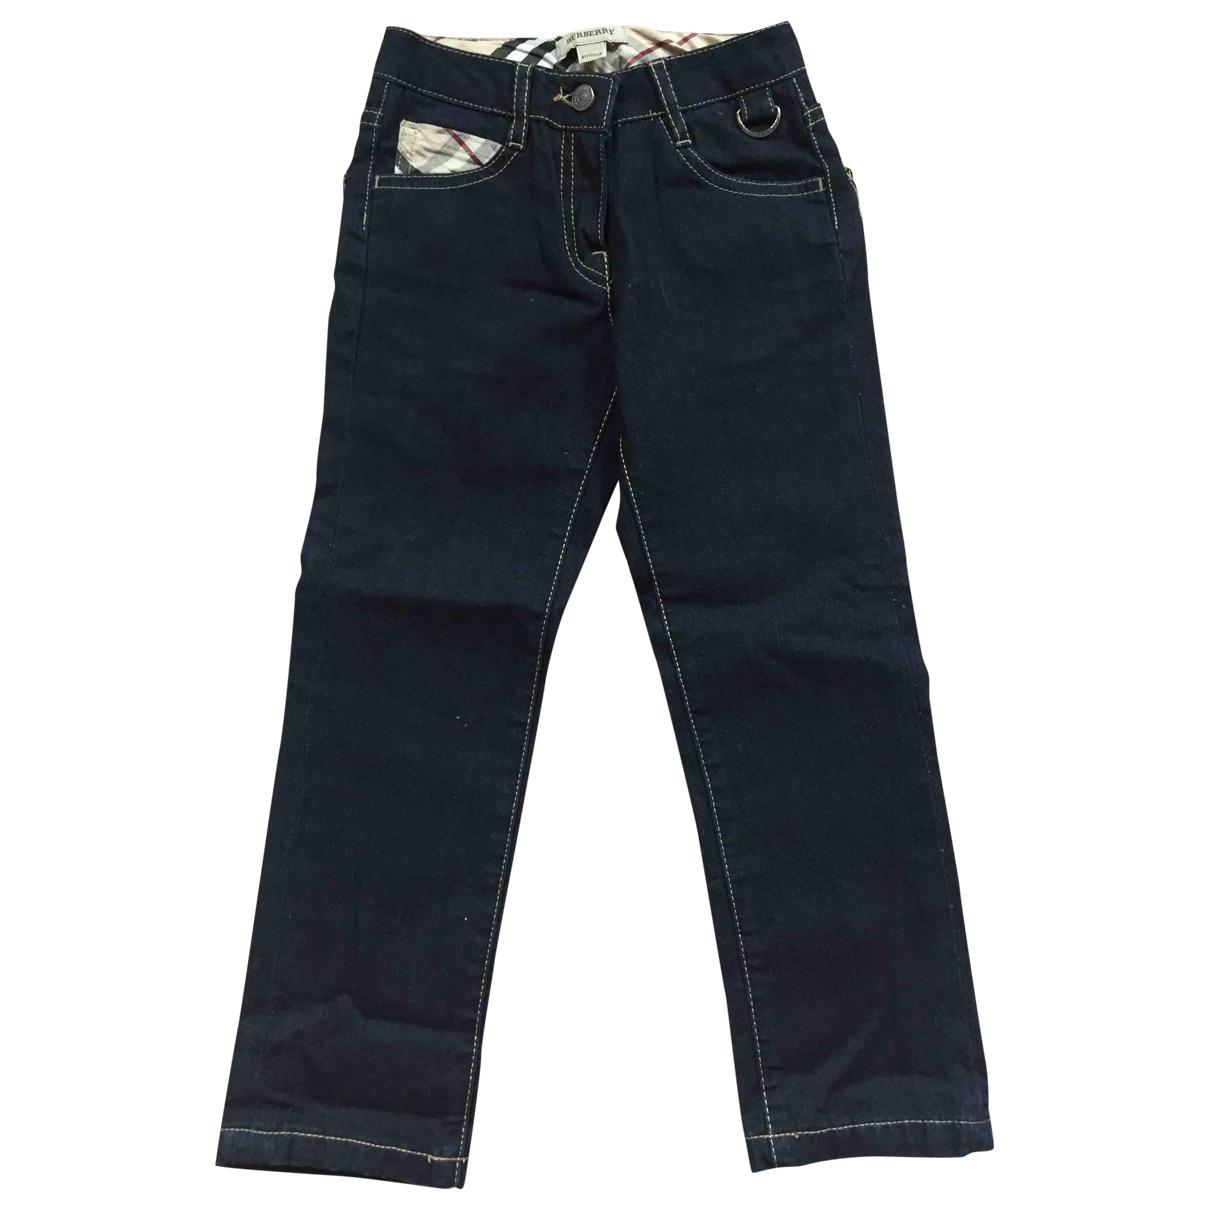 Burberry - Pantalon   pour enfant en coton - bleu